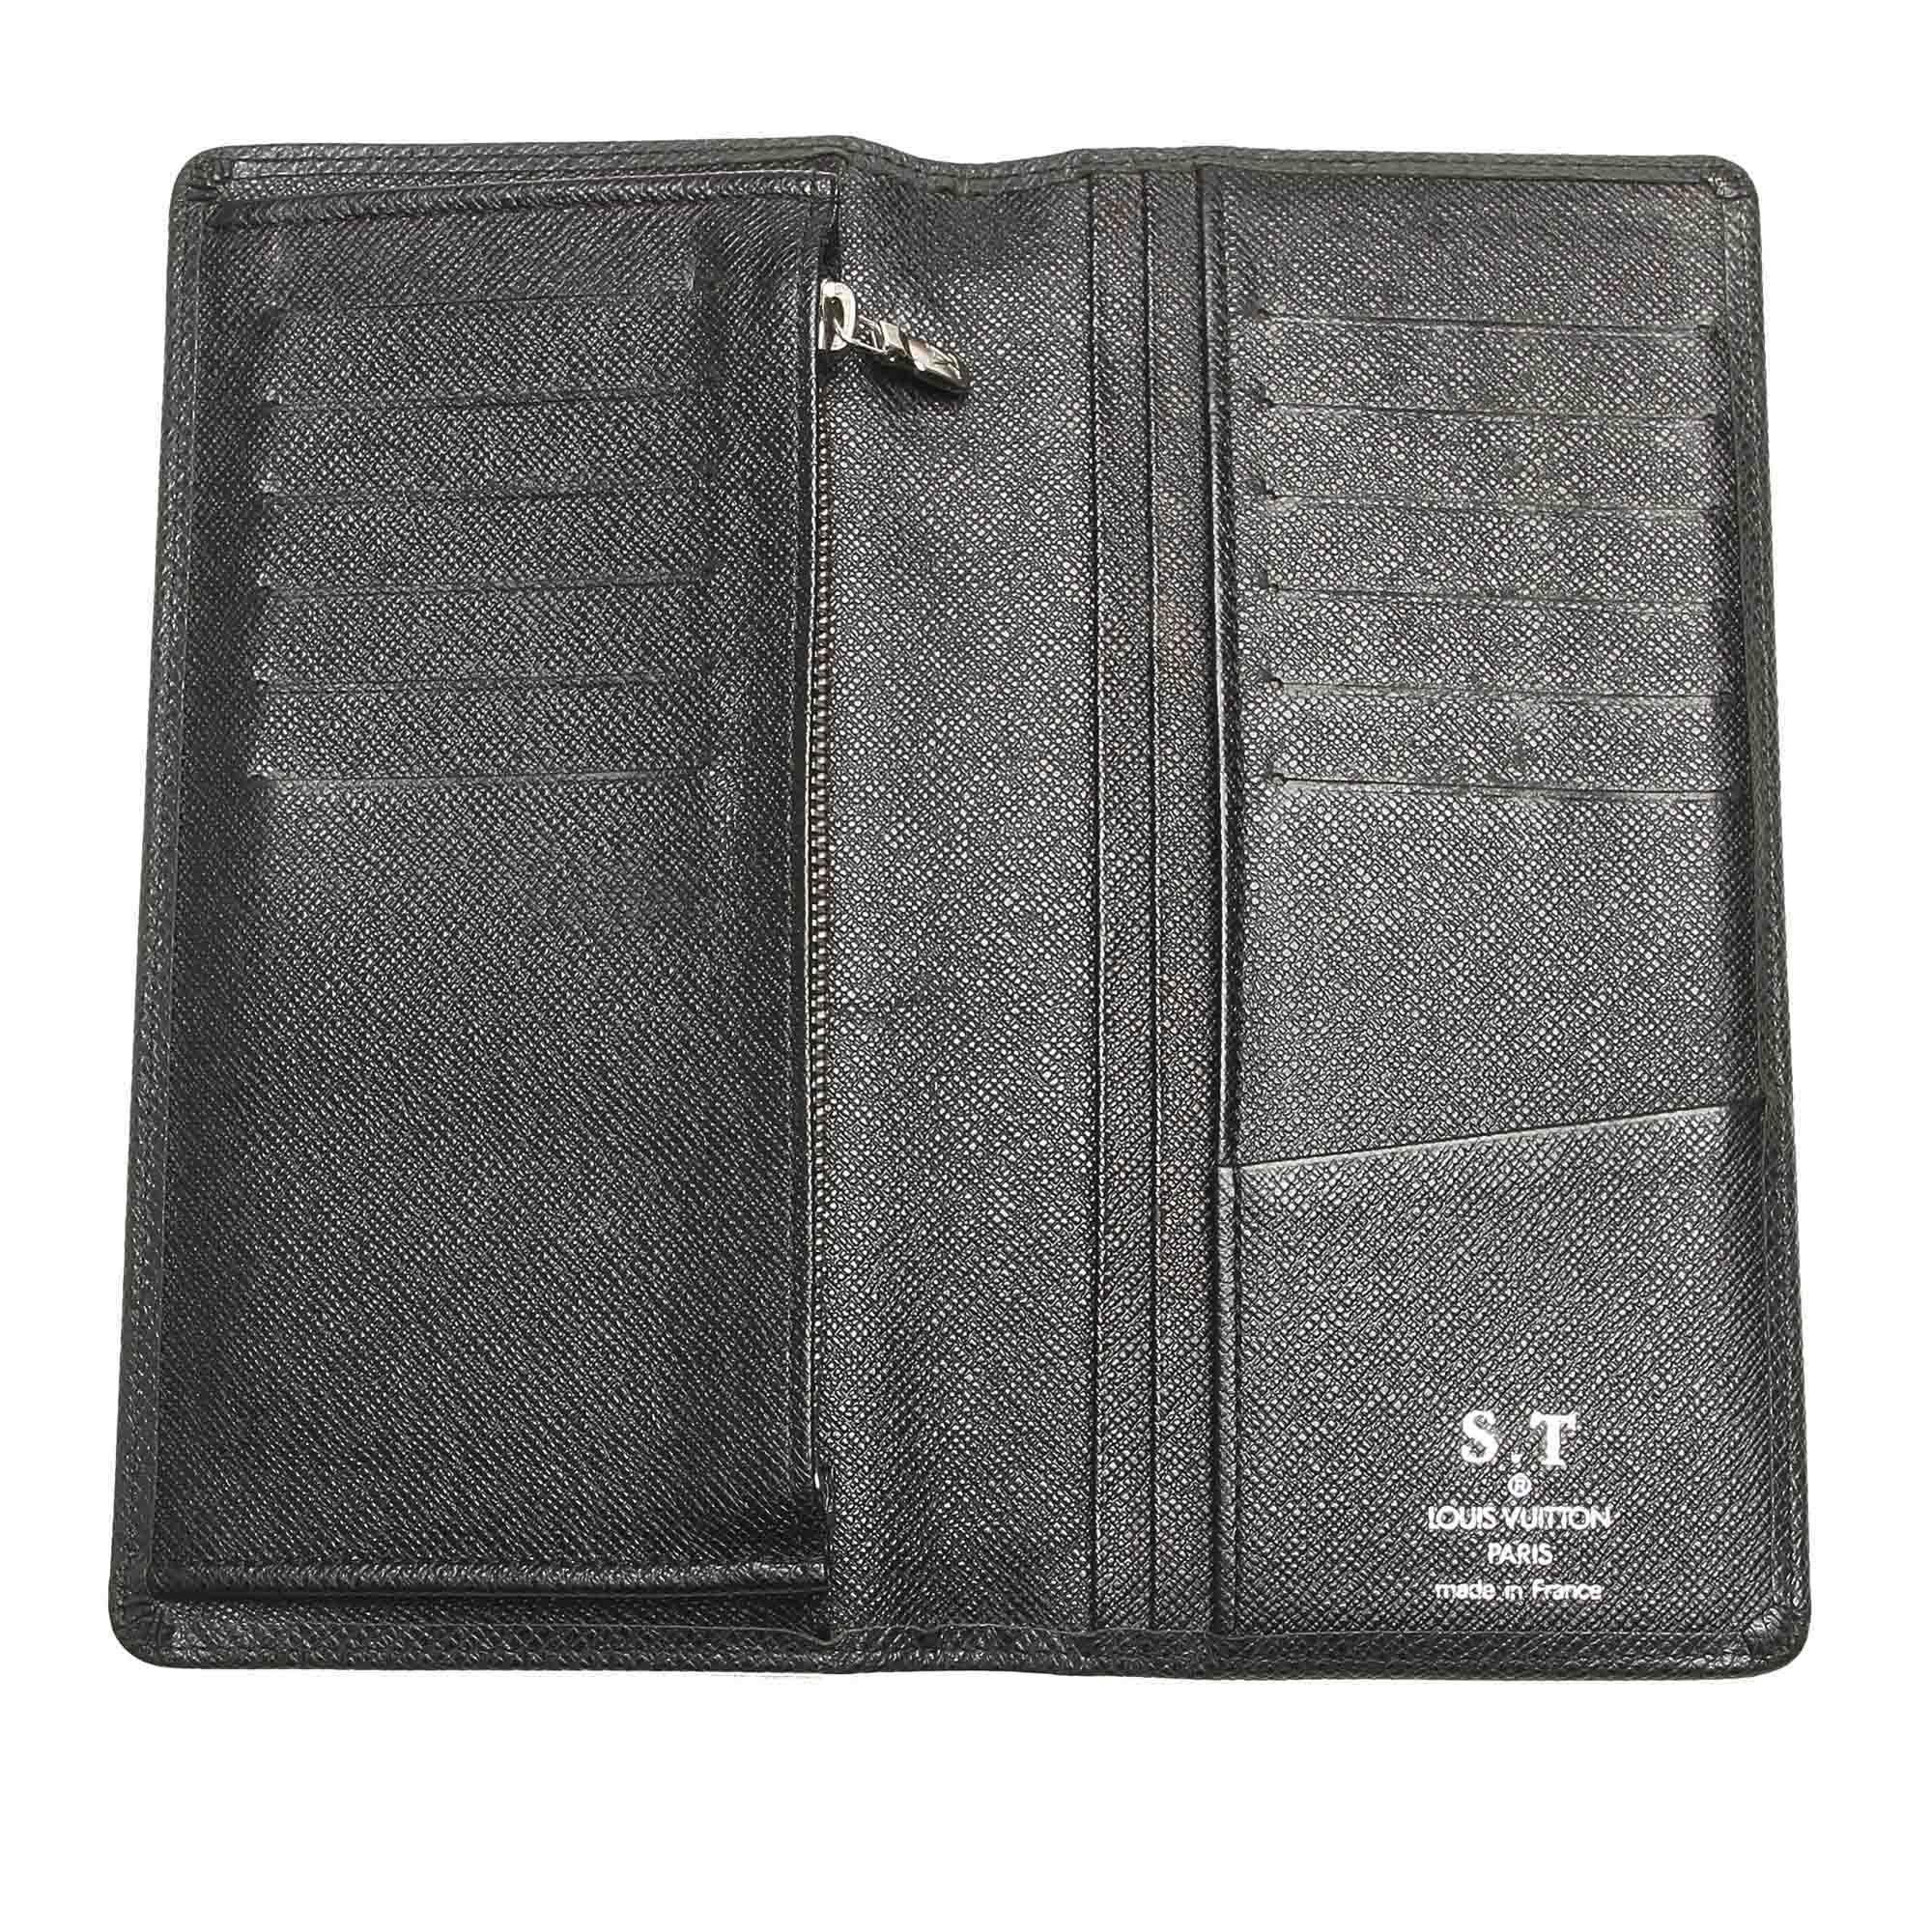 Vintage Louis Vuitton Taiga Long Wallet Black